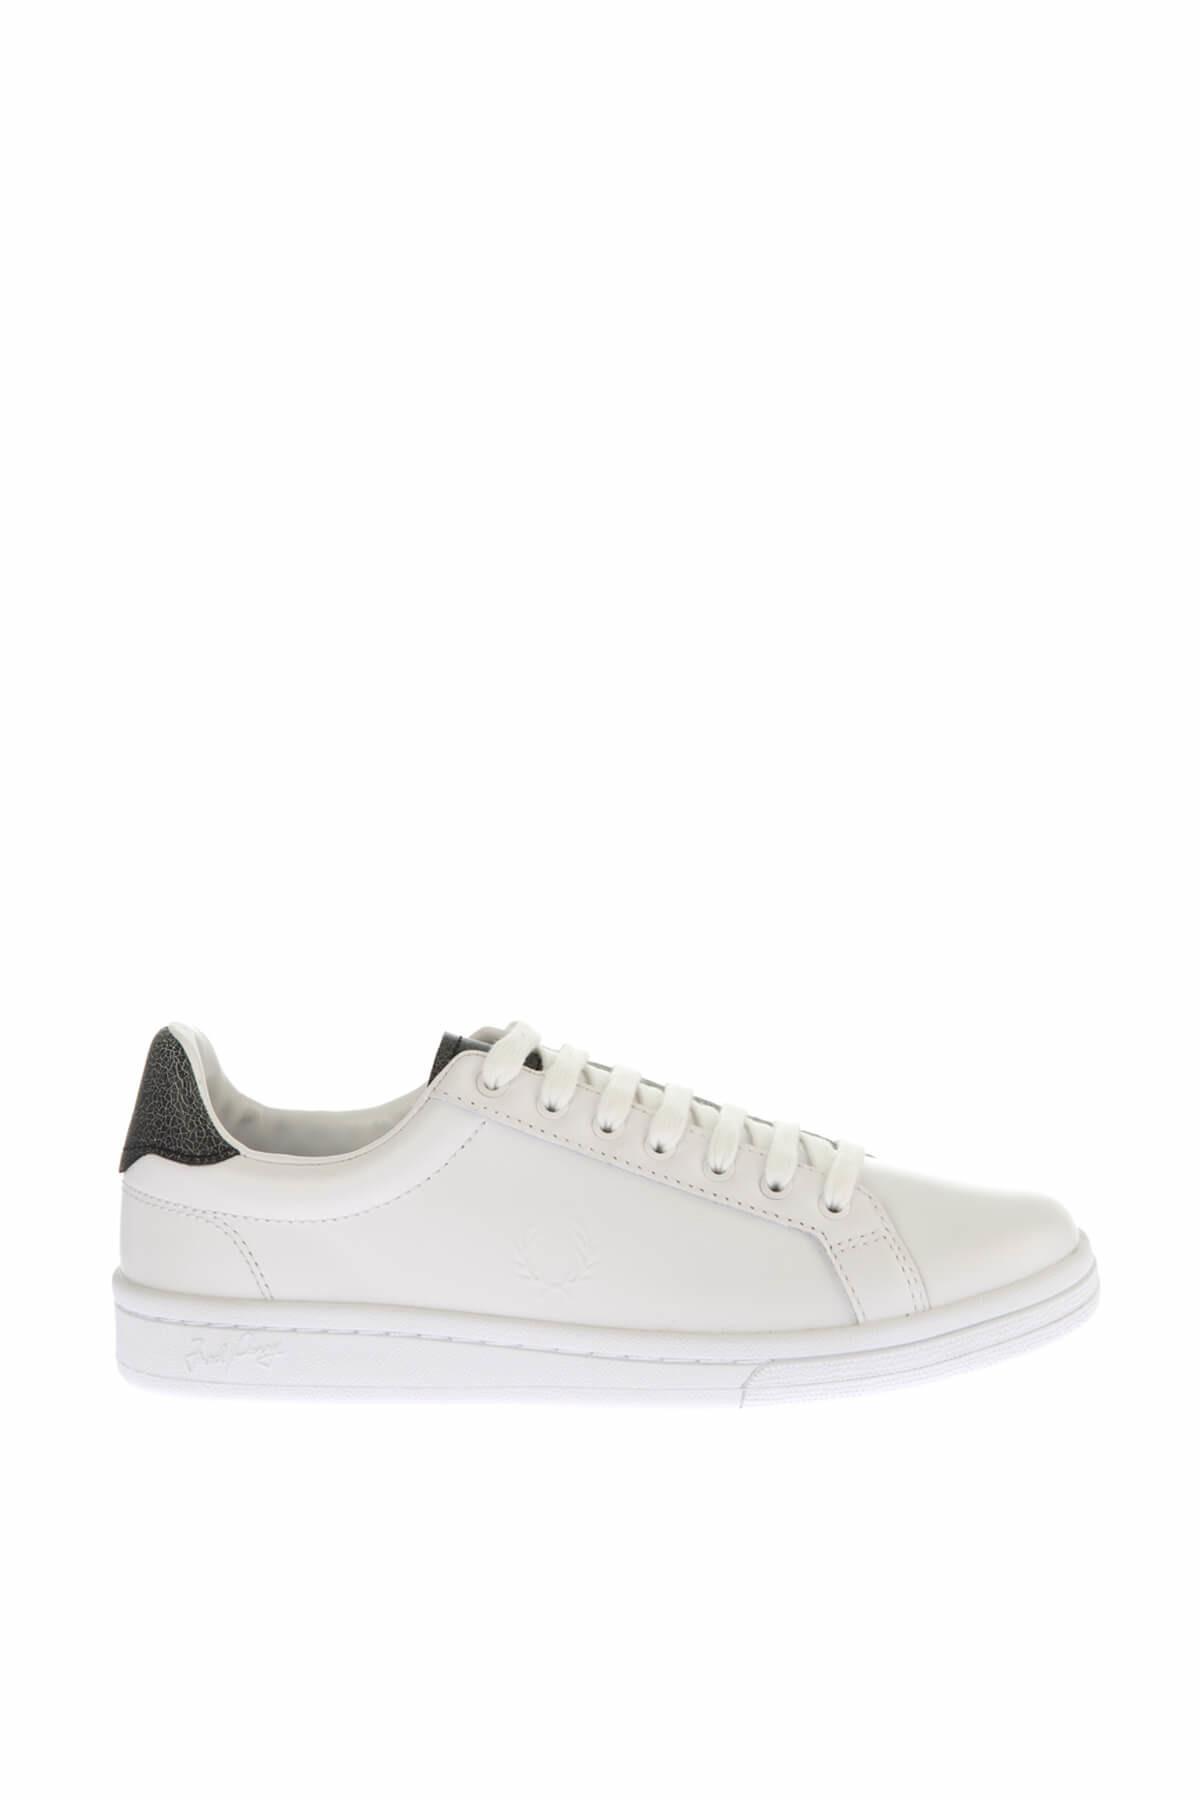 Fred Perry Kadın Beyaz Sneaker 181FRPKAYB3106 1